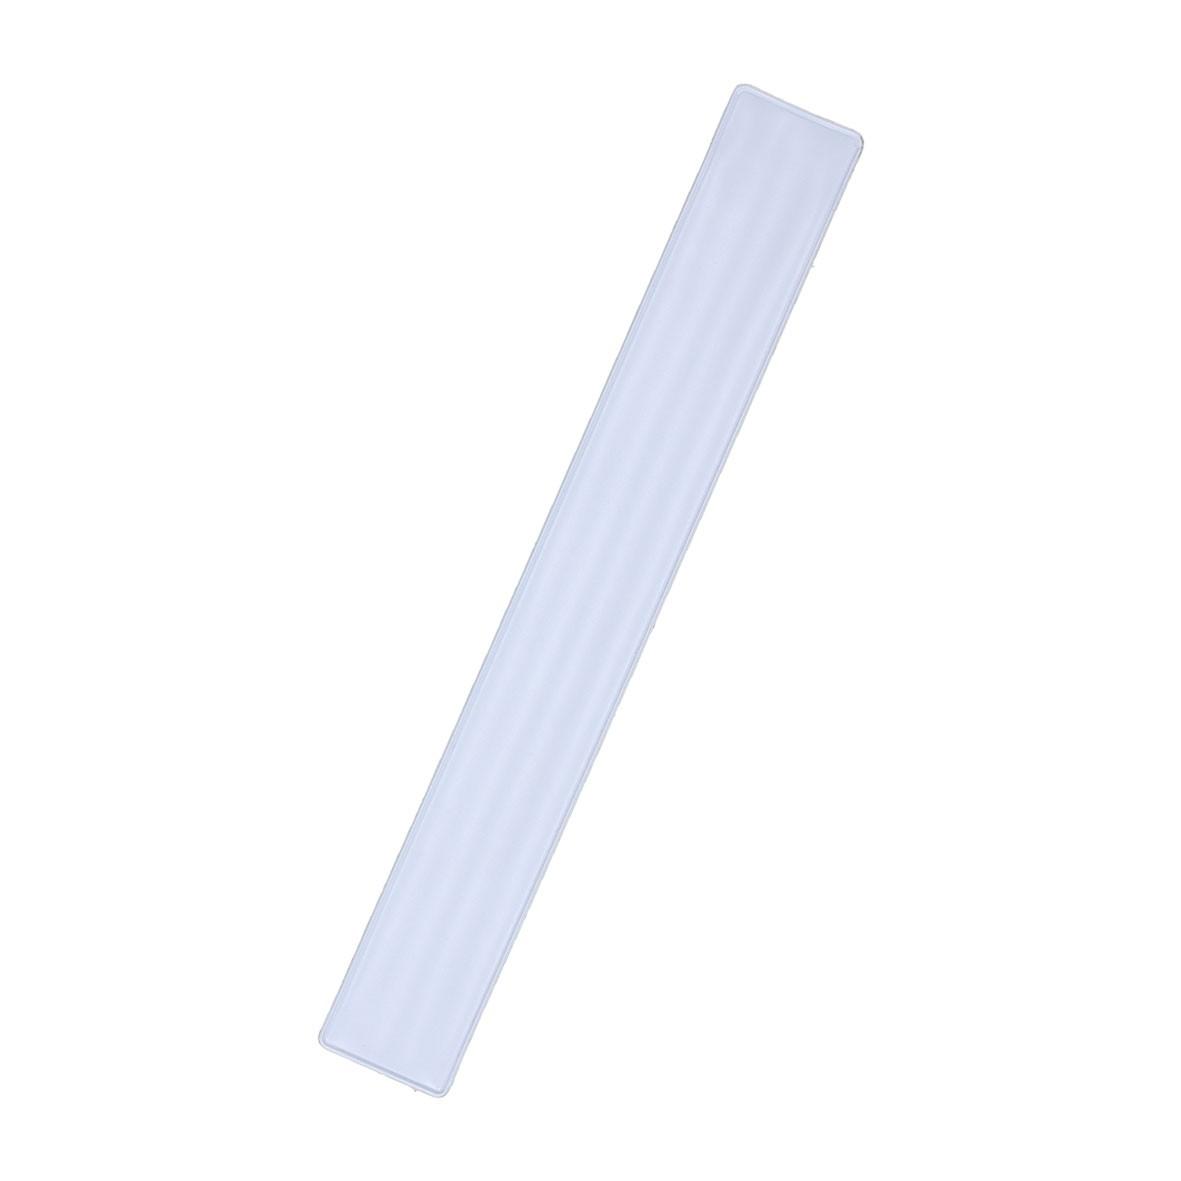 "Snap-Armband ""Clacky"" 22 cm weiß"